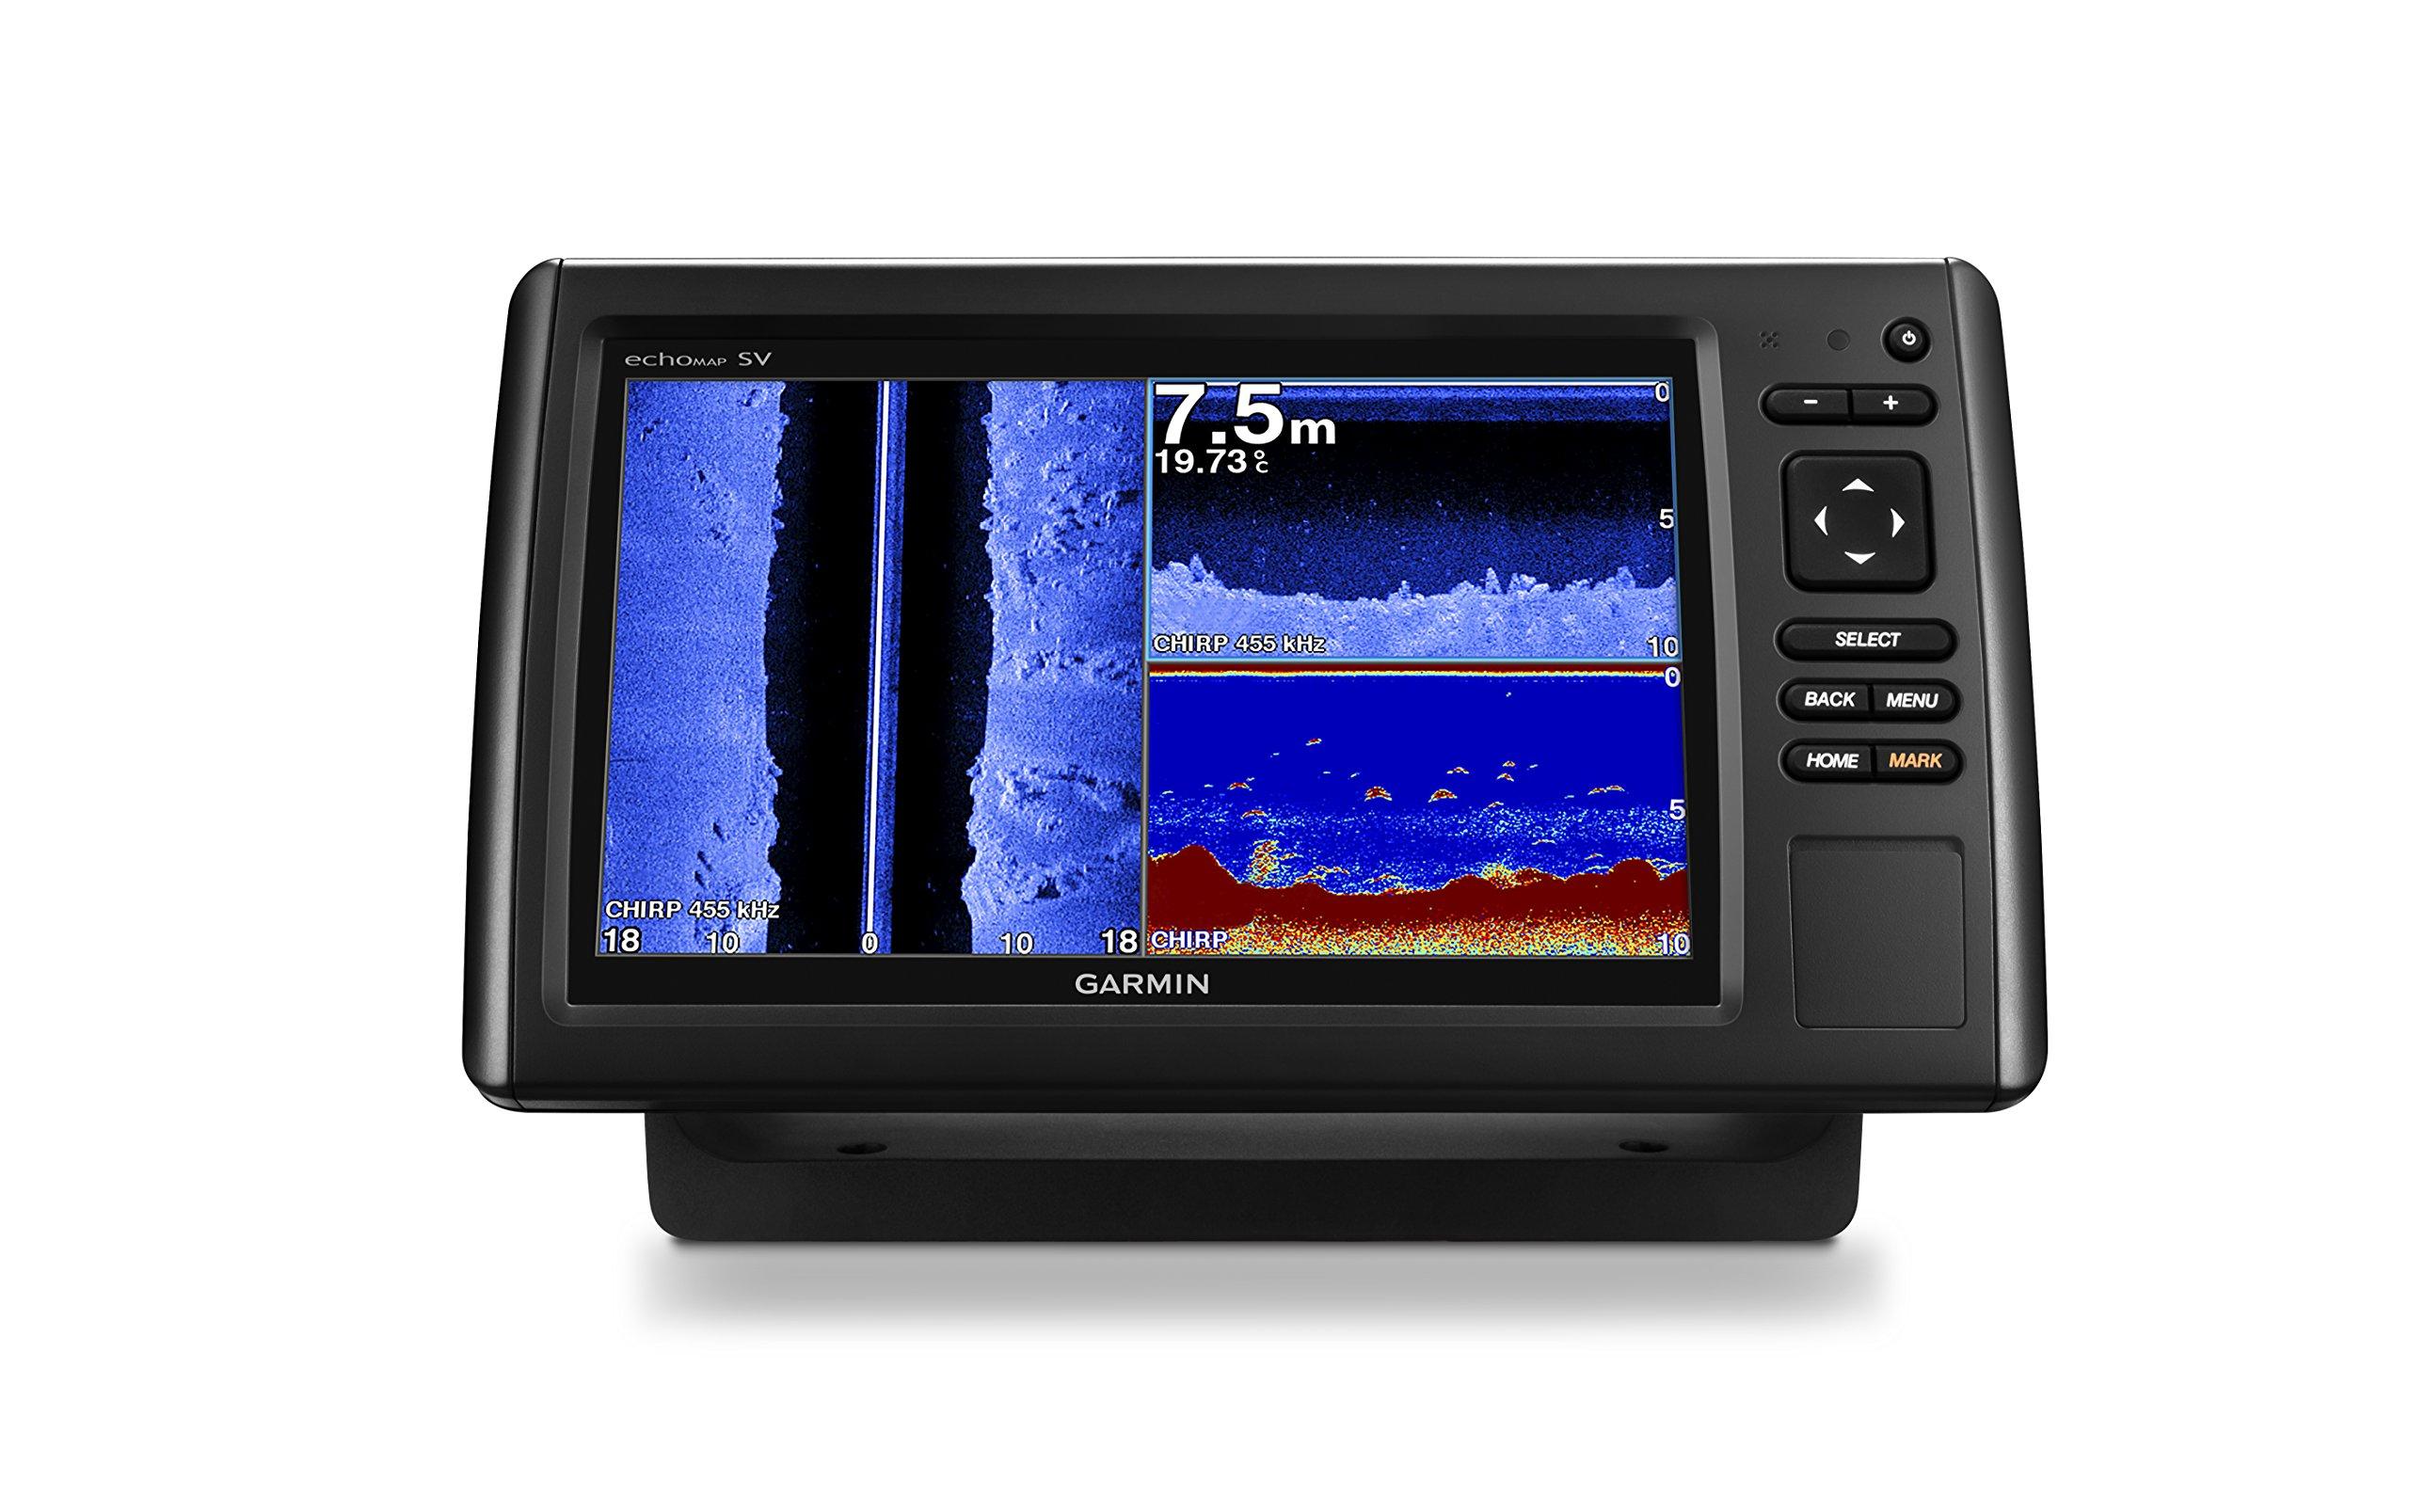 Garmin 010-01805-01 Echomap Chirp 94SV with transducer